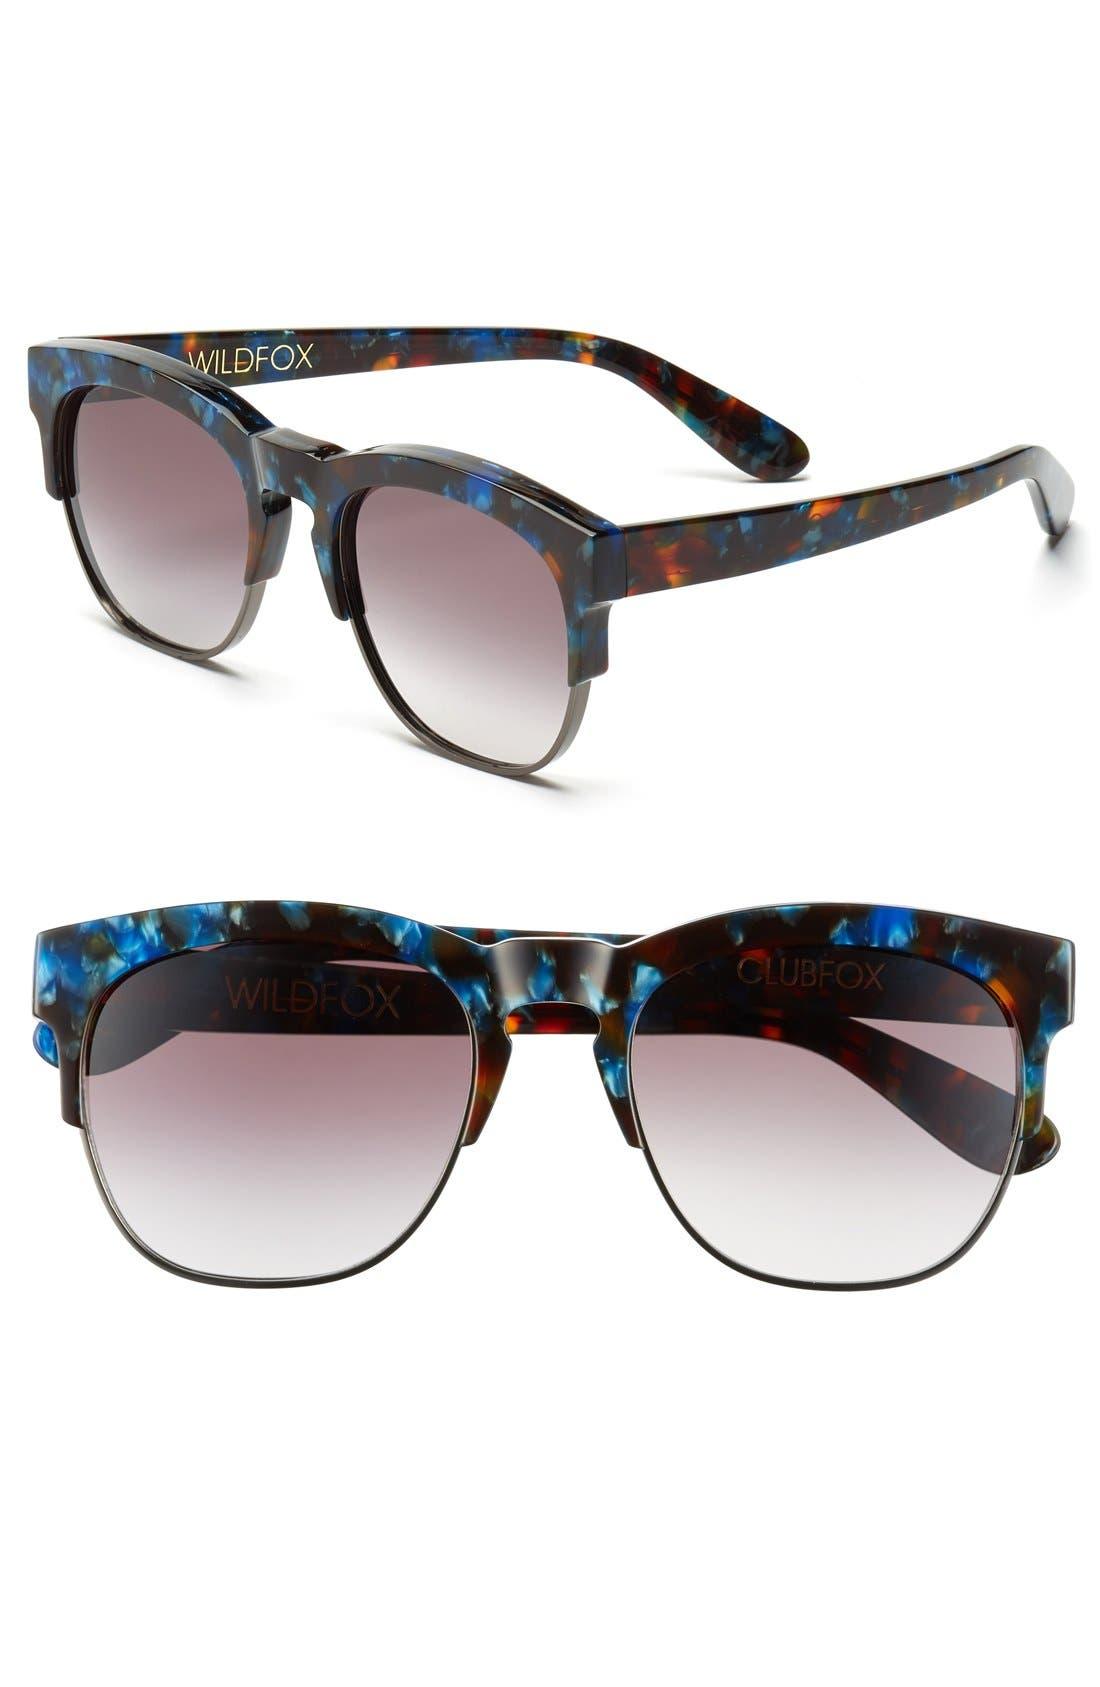 Main Image - Wildfox 'Club Fox' 52mm Sunglasses